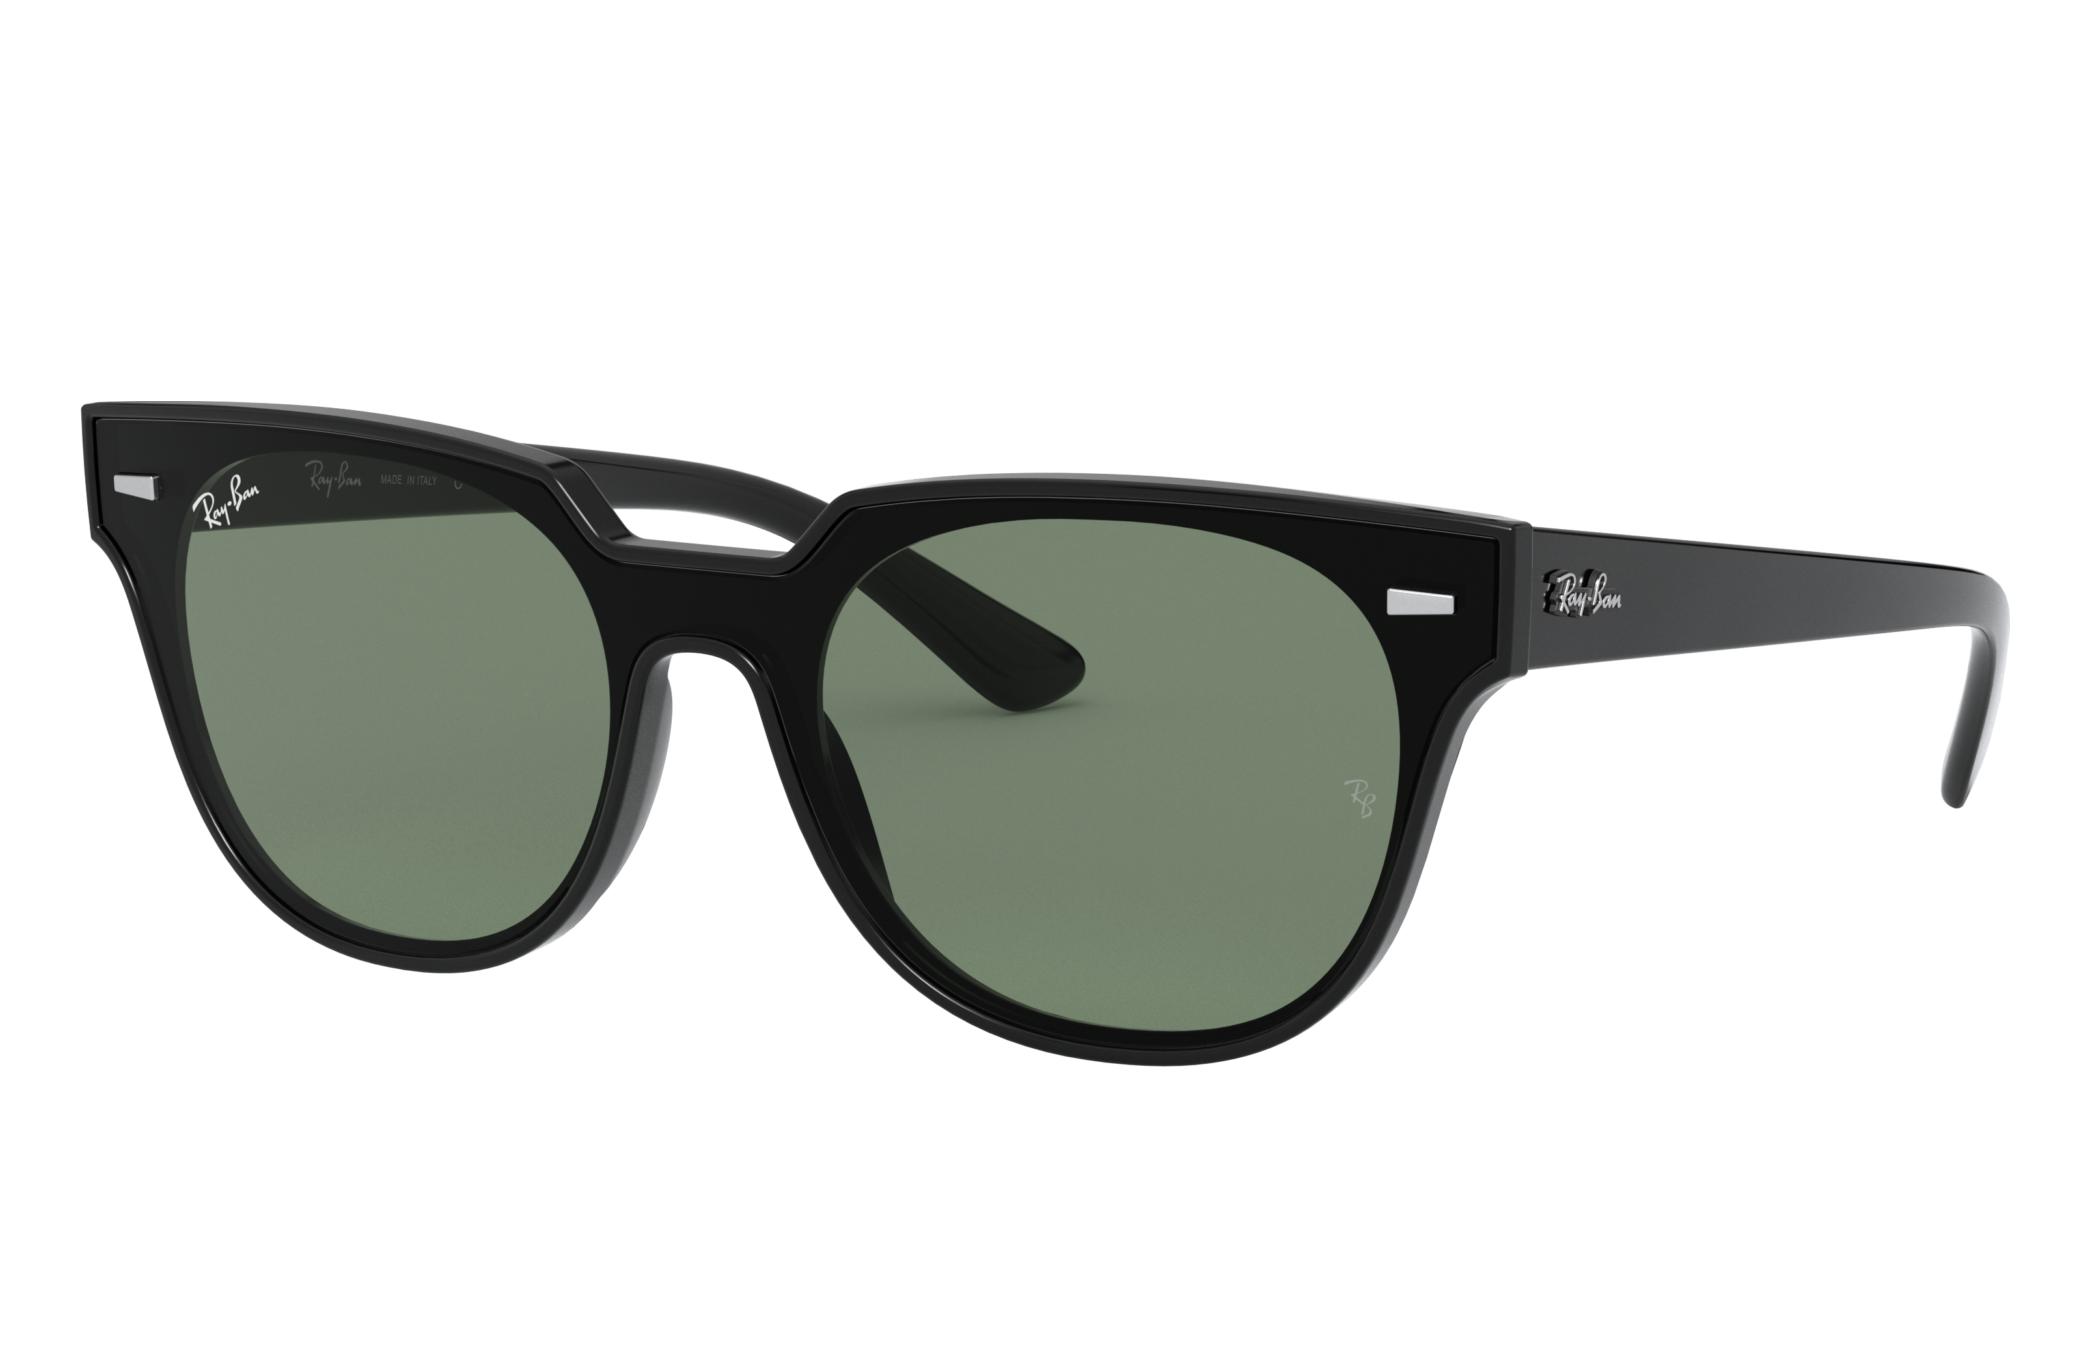 Ray-Ban Blaze Meteor Black, Green Lenses - RB4368N